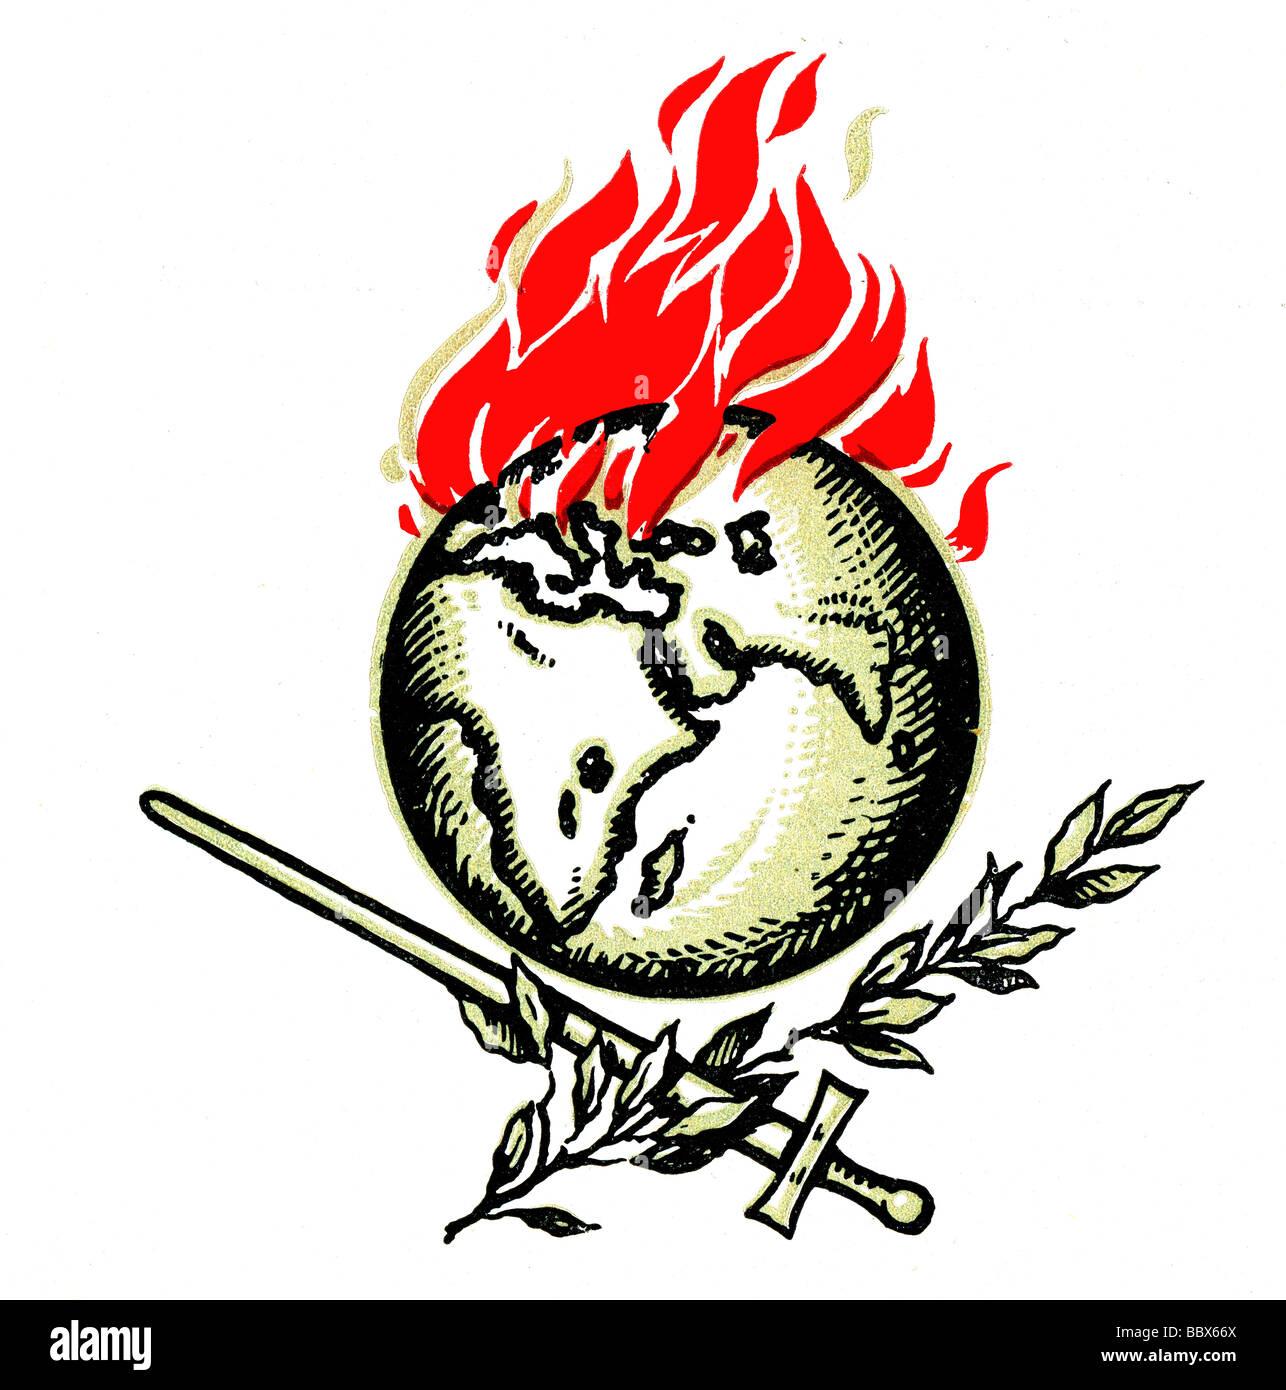 events, First World War / WWI, propaganda, symbol, 20th century, globe, earth, burning, flames, flame, fire, sword, - Stock Image